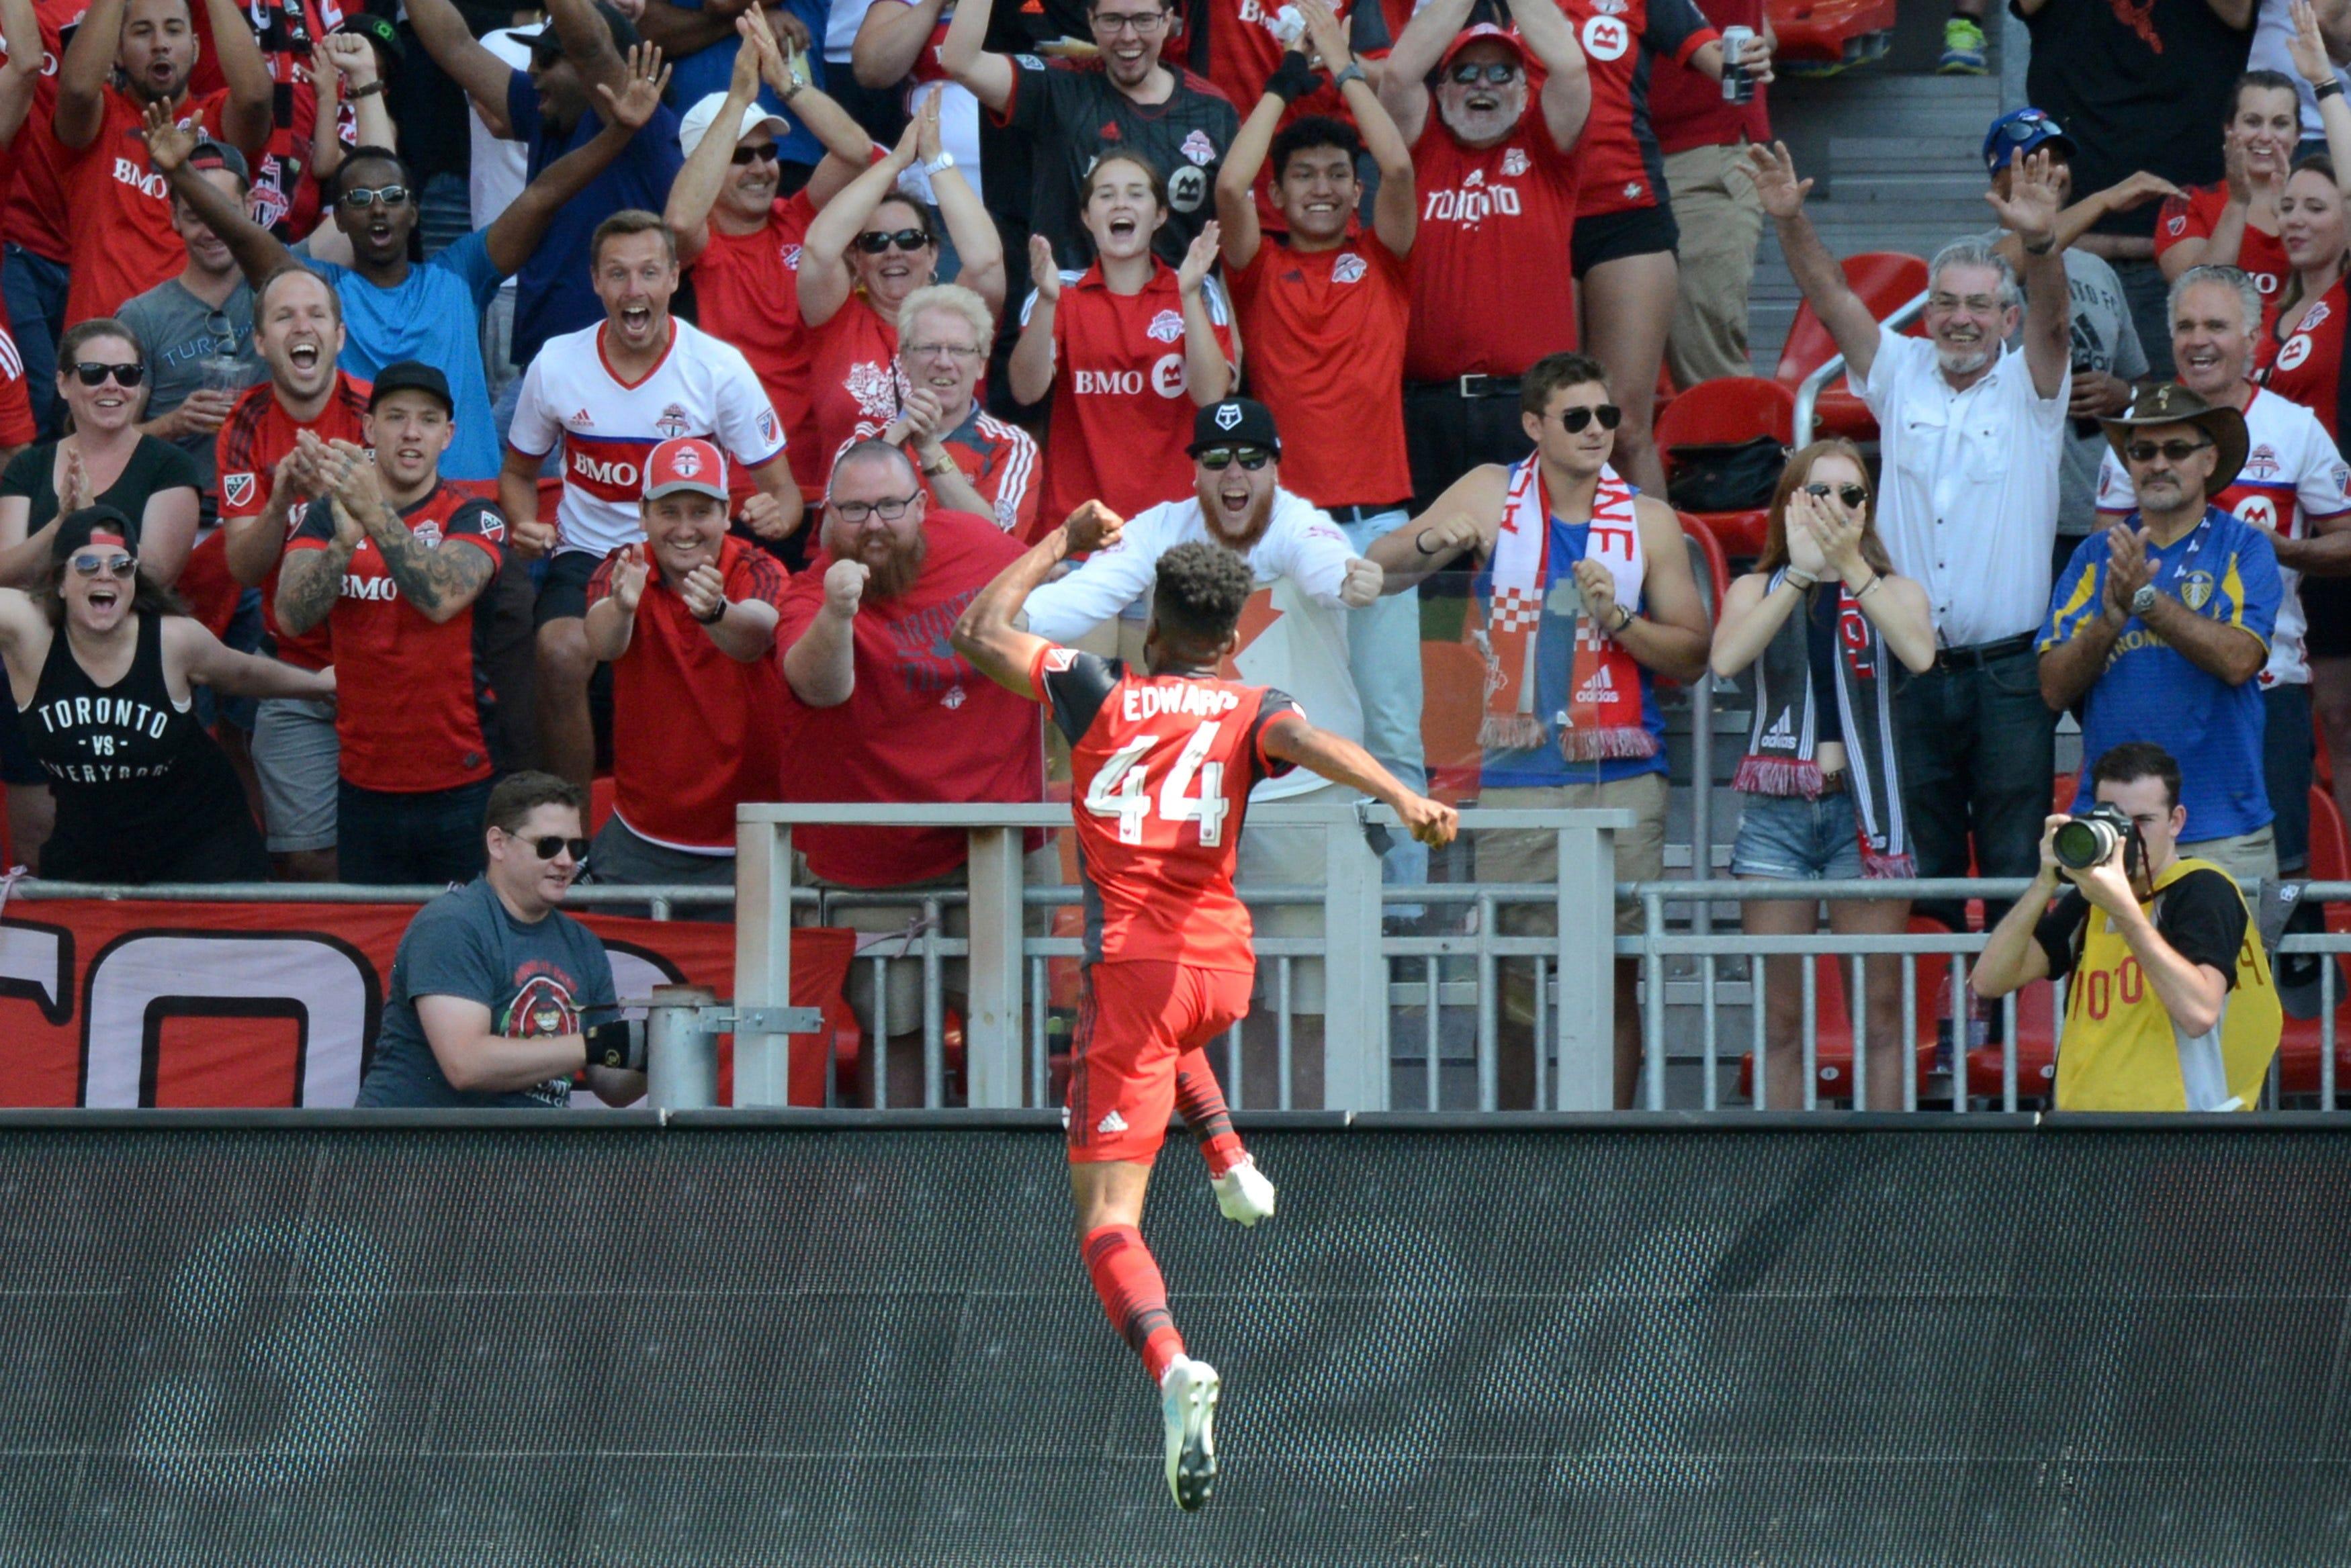 Giovinco scores twice, Toronto FC beats NYC FC 4-0